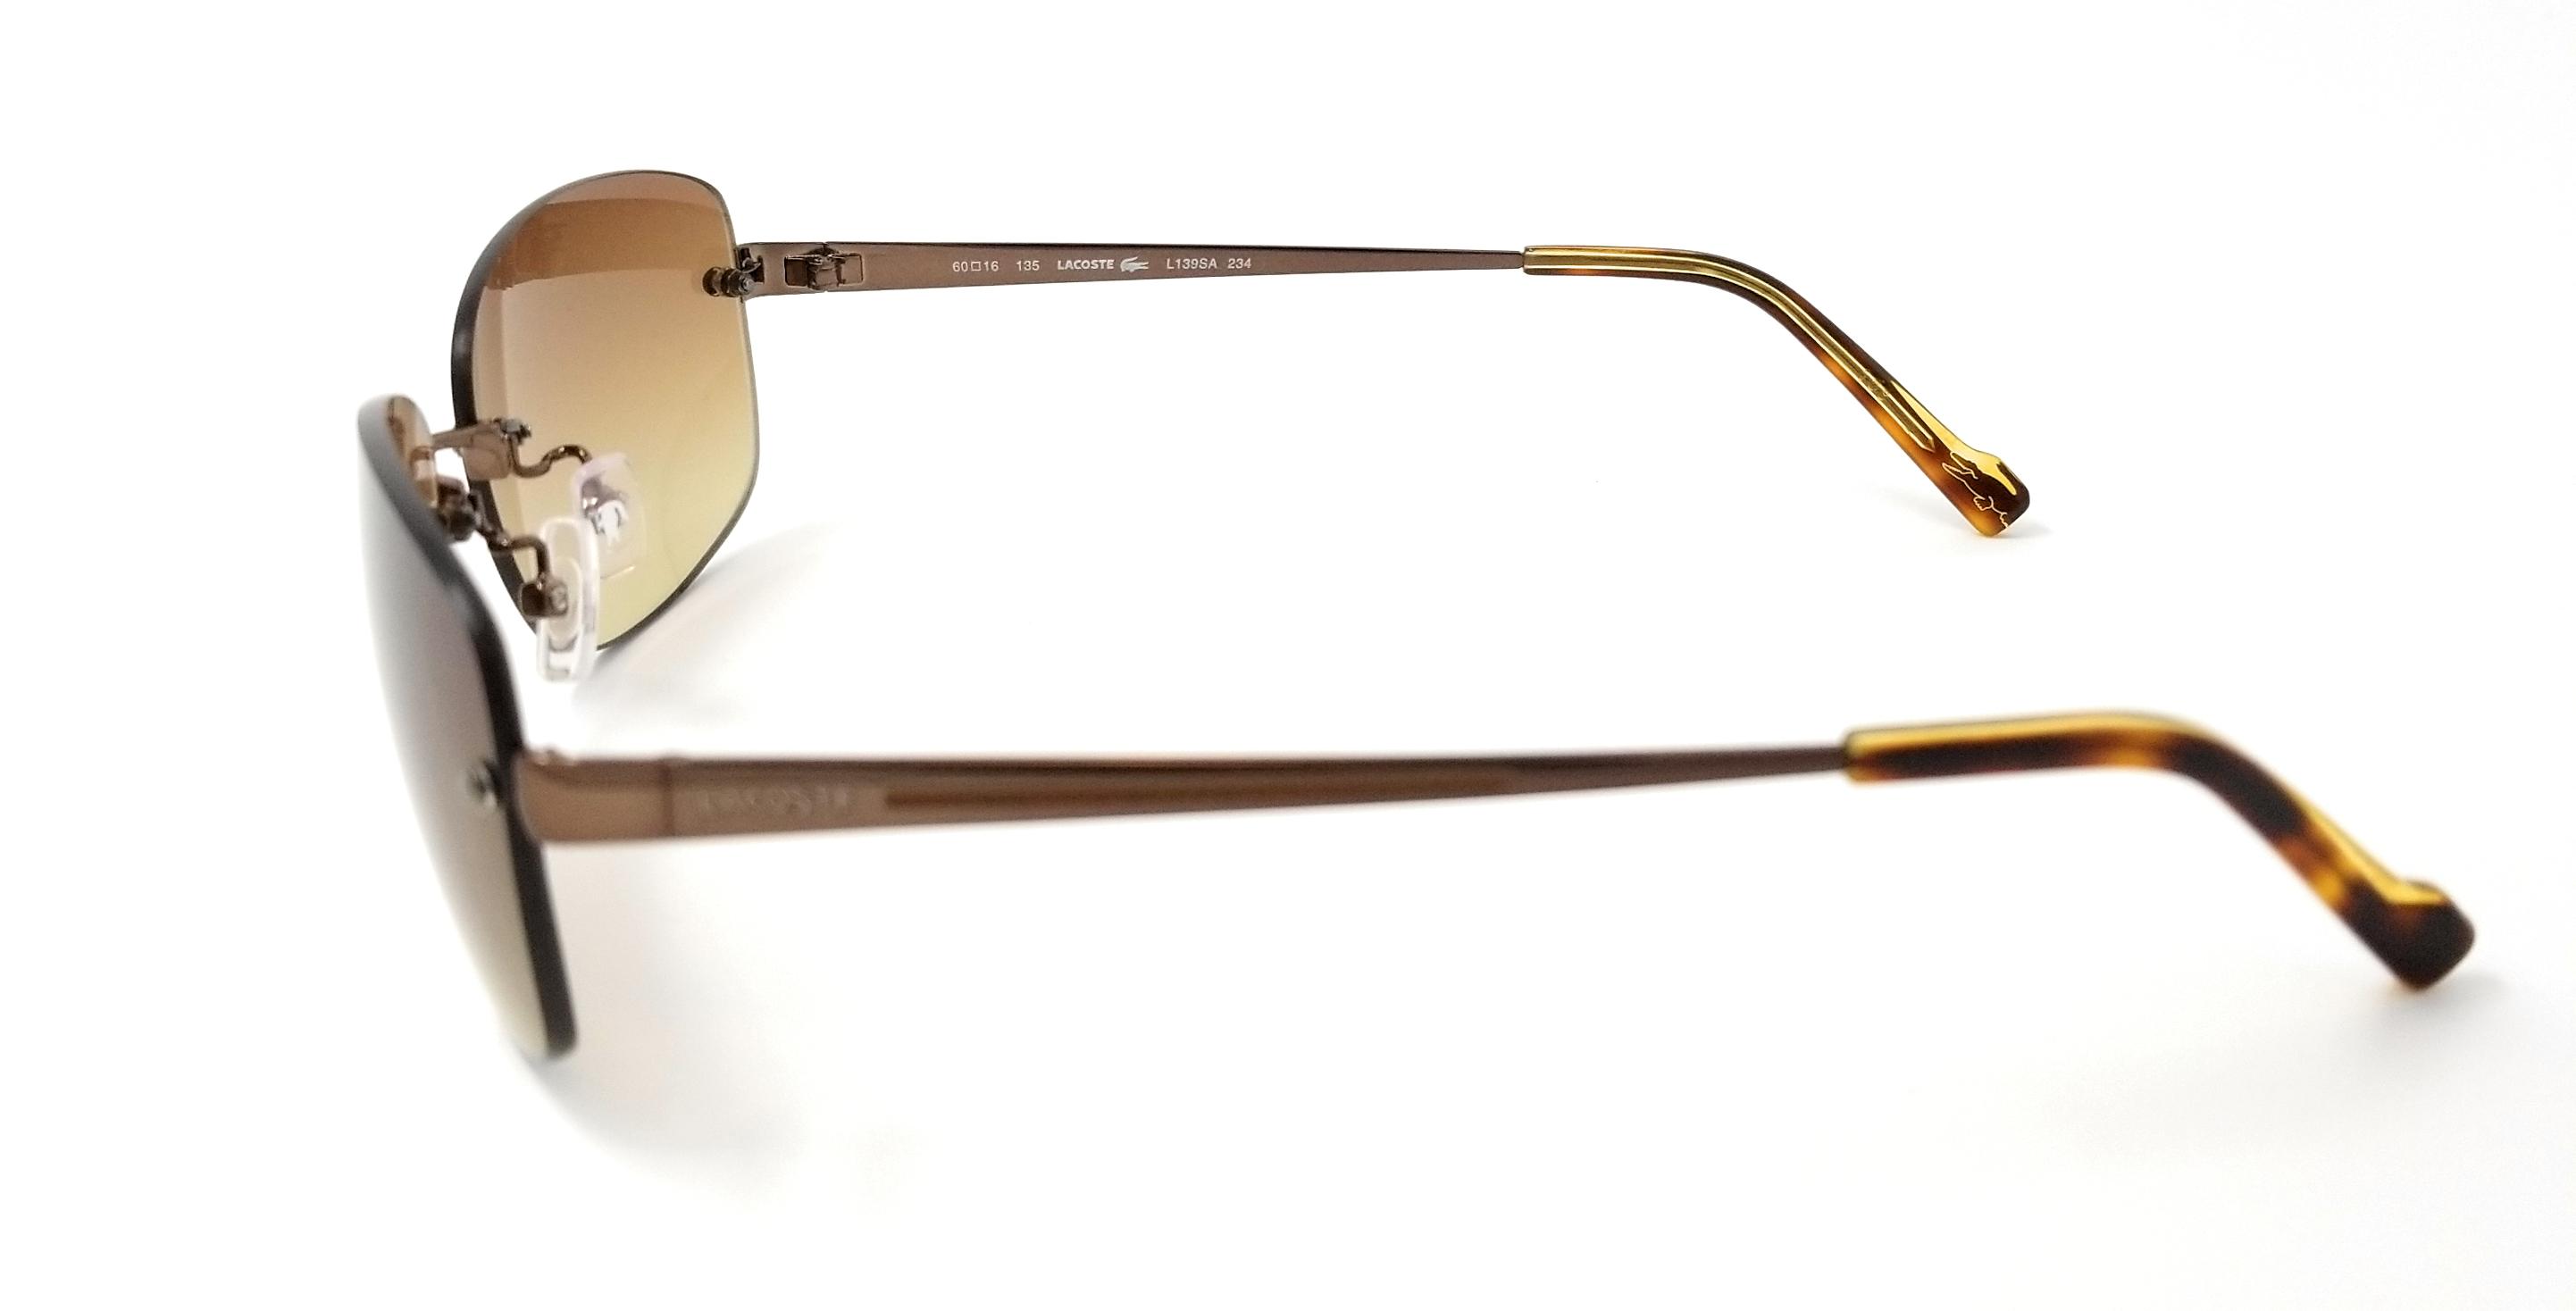 fec9bf01b2f836 Lacoste - LACOSTE Sunglasses L139SA 234 Shiny Ligh Rectangular Womens  60x16x135 - Walmart.com